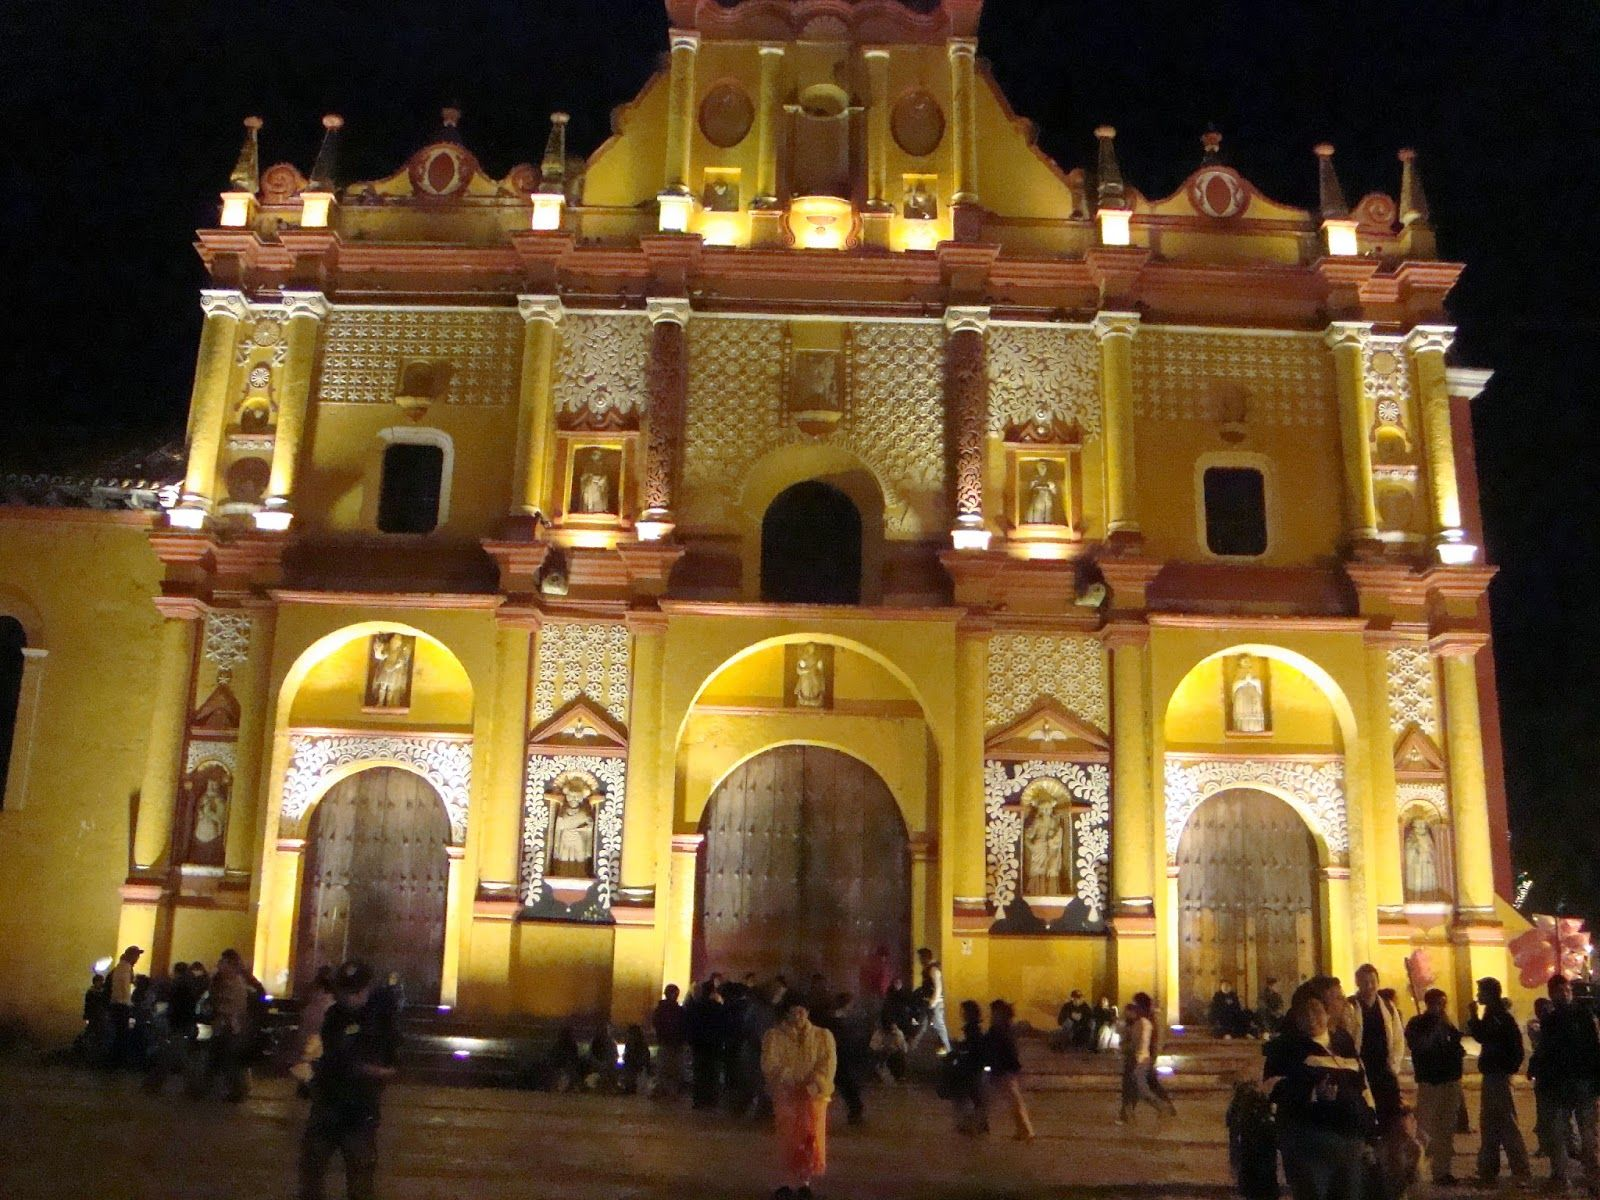 Un poquito de aquí... Un poquito de allá...: Conoce: Chiapas, sus 10 Lugares Más Famosos e Incr...